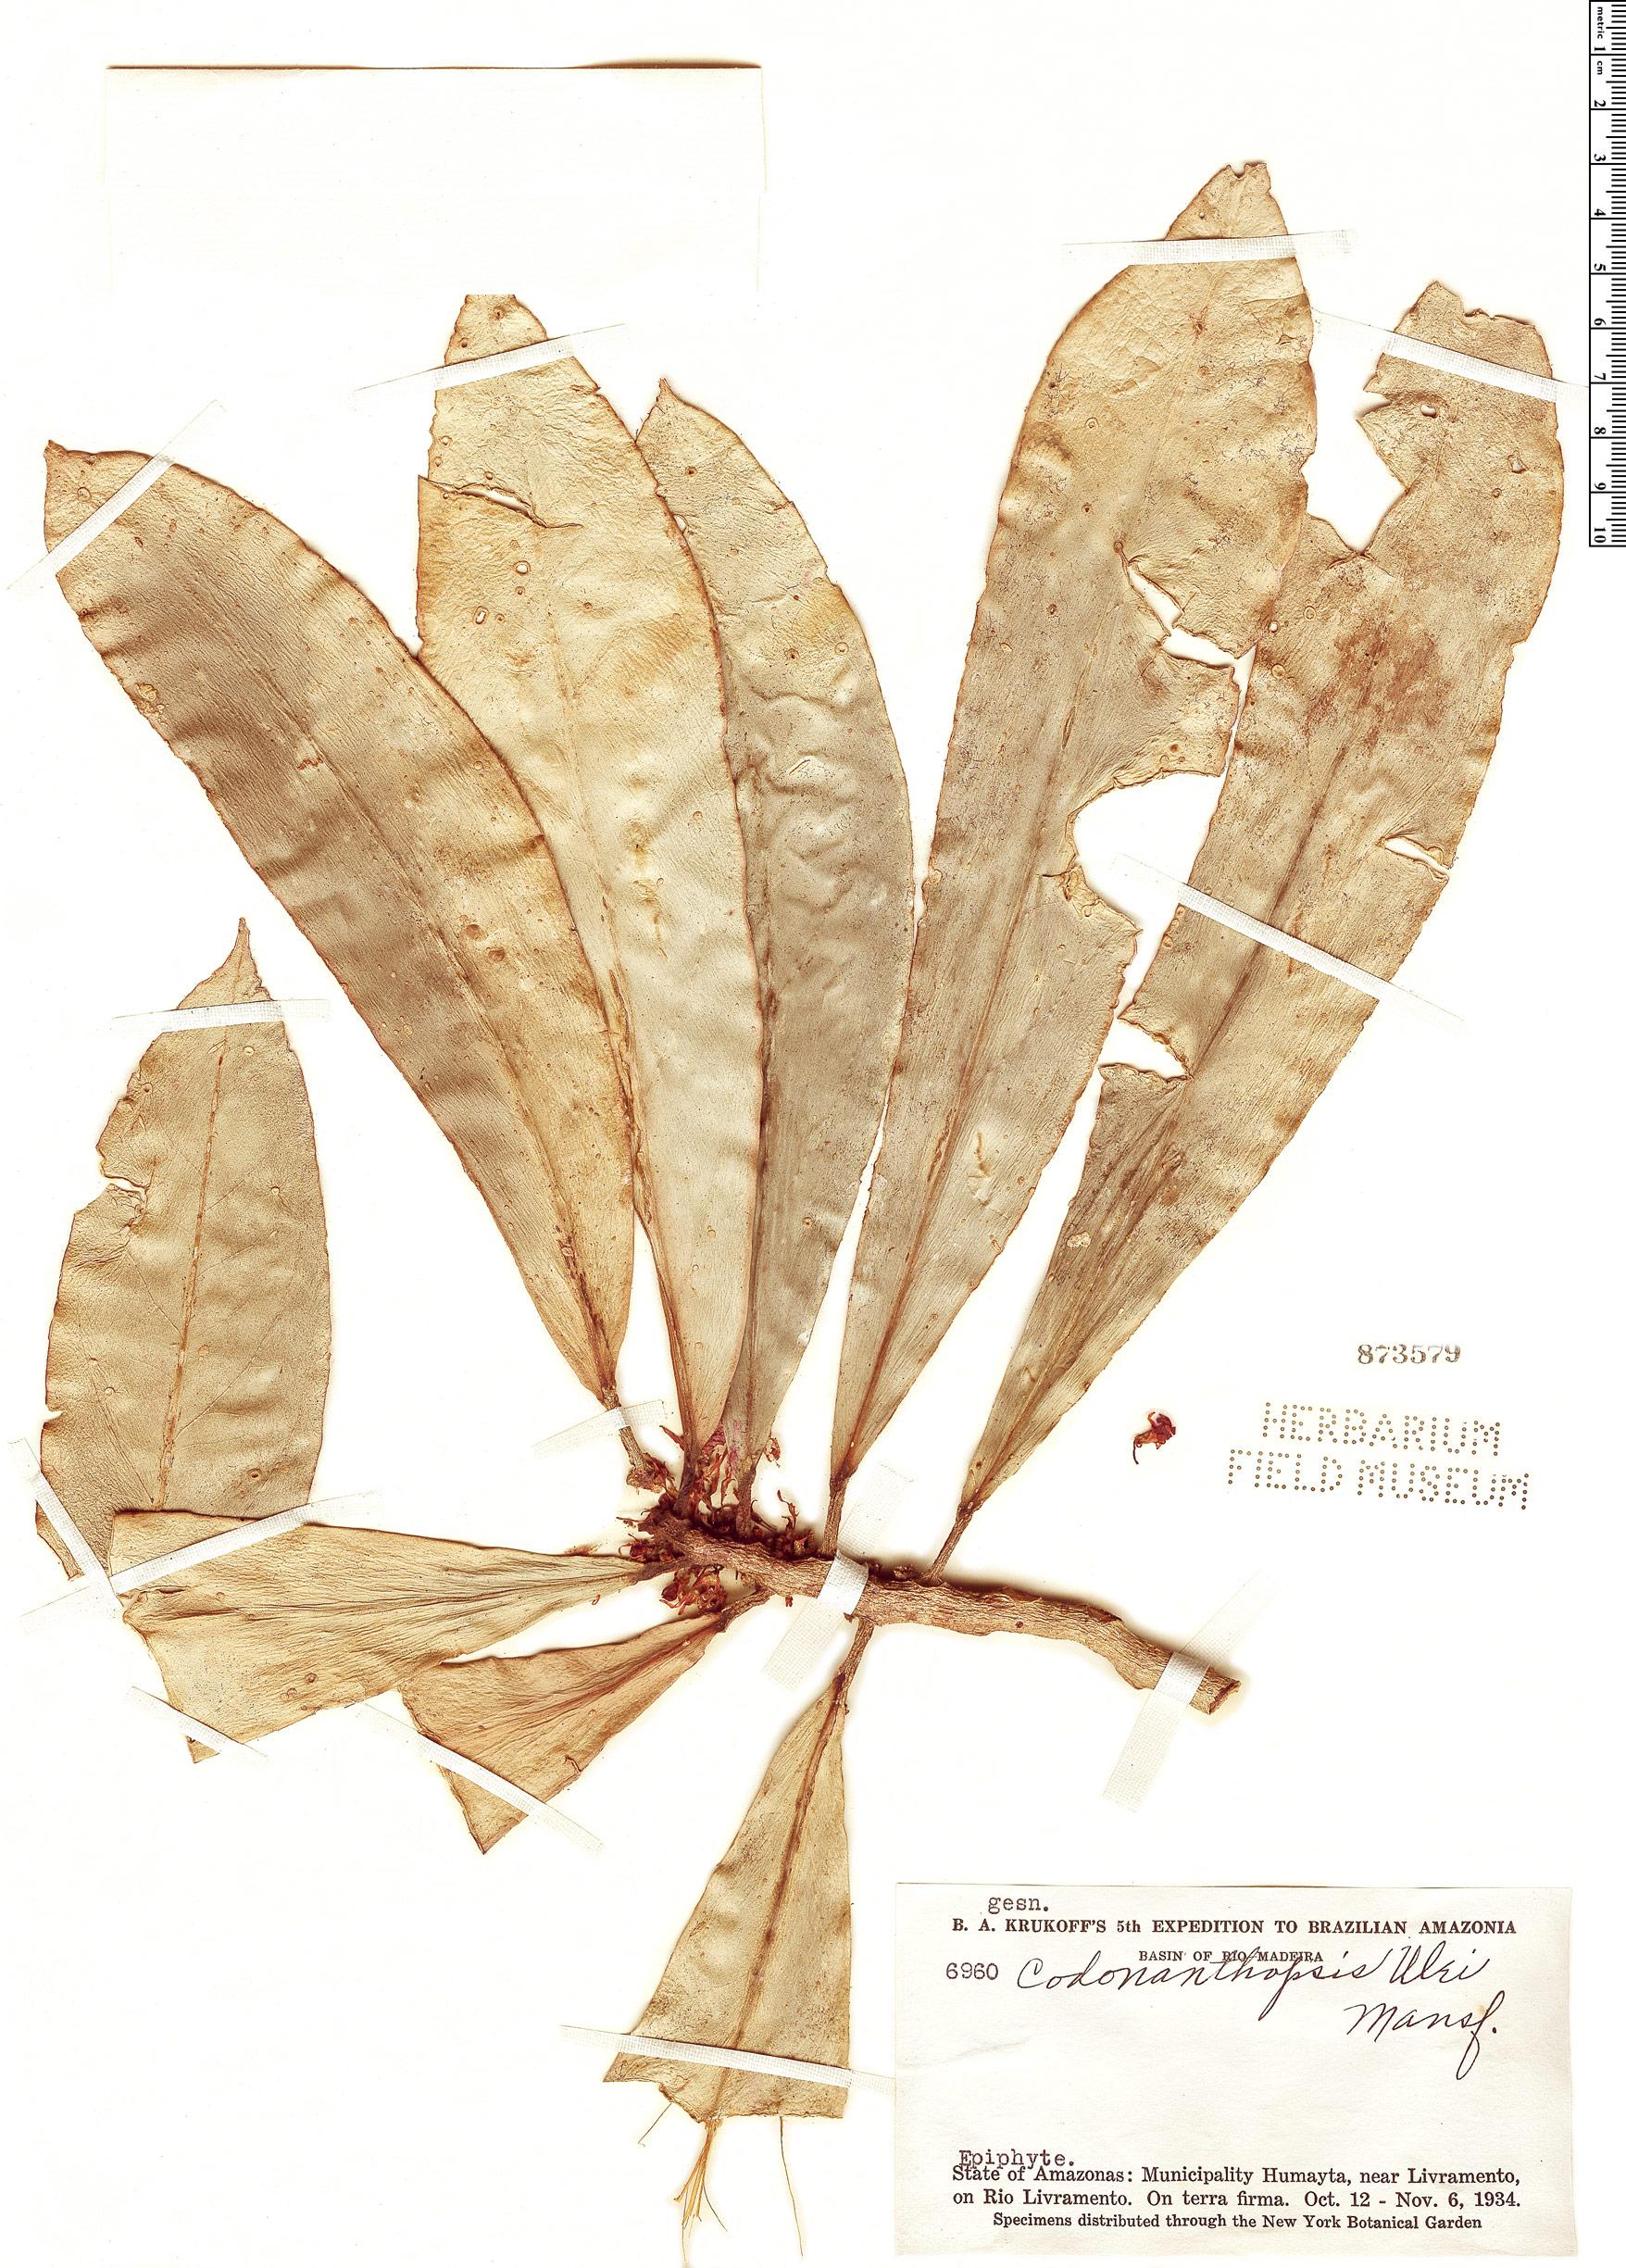 Specimen: Codonanthopsis ulei